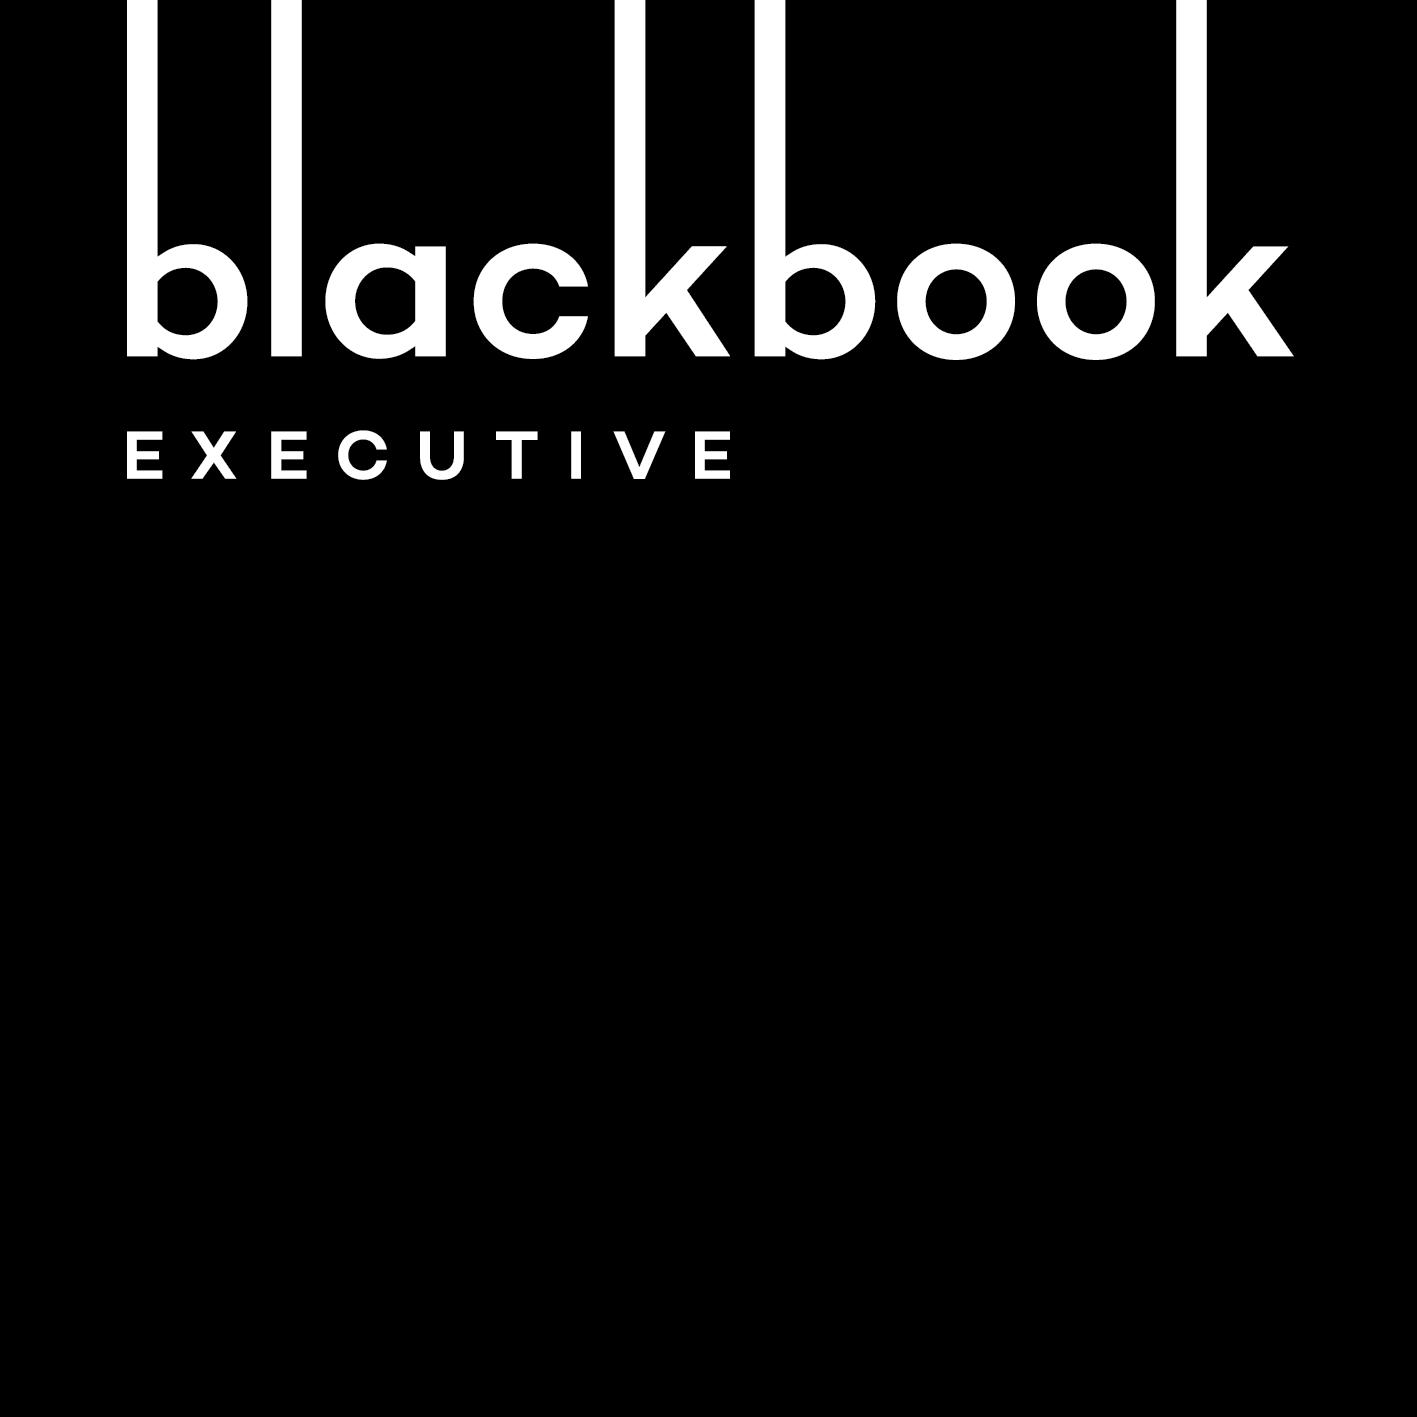 Blackbook Executive (@BlackbookExec) | Twitter